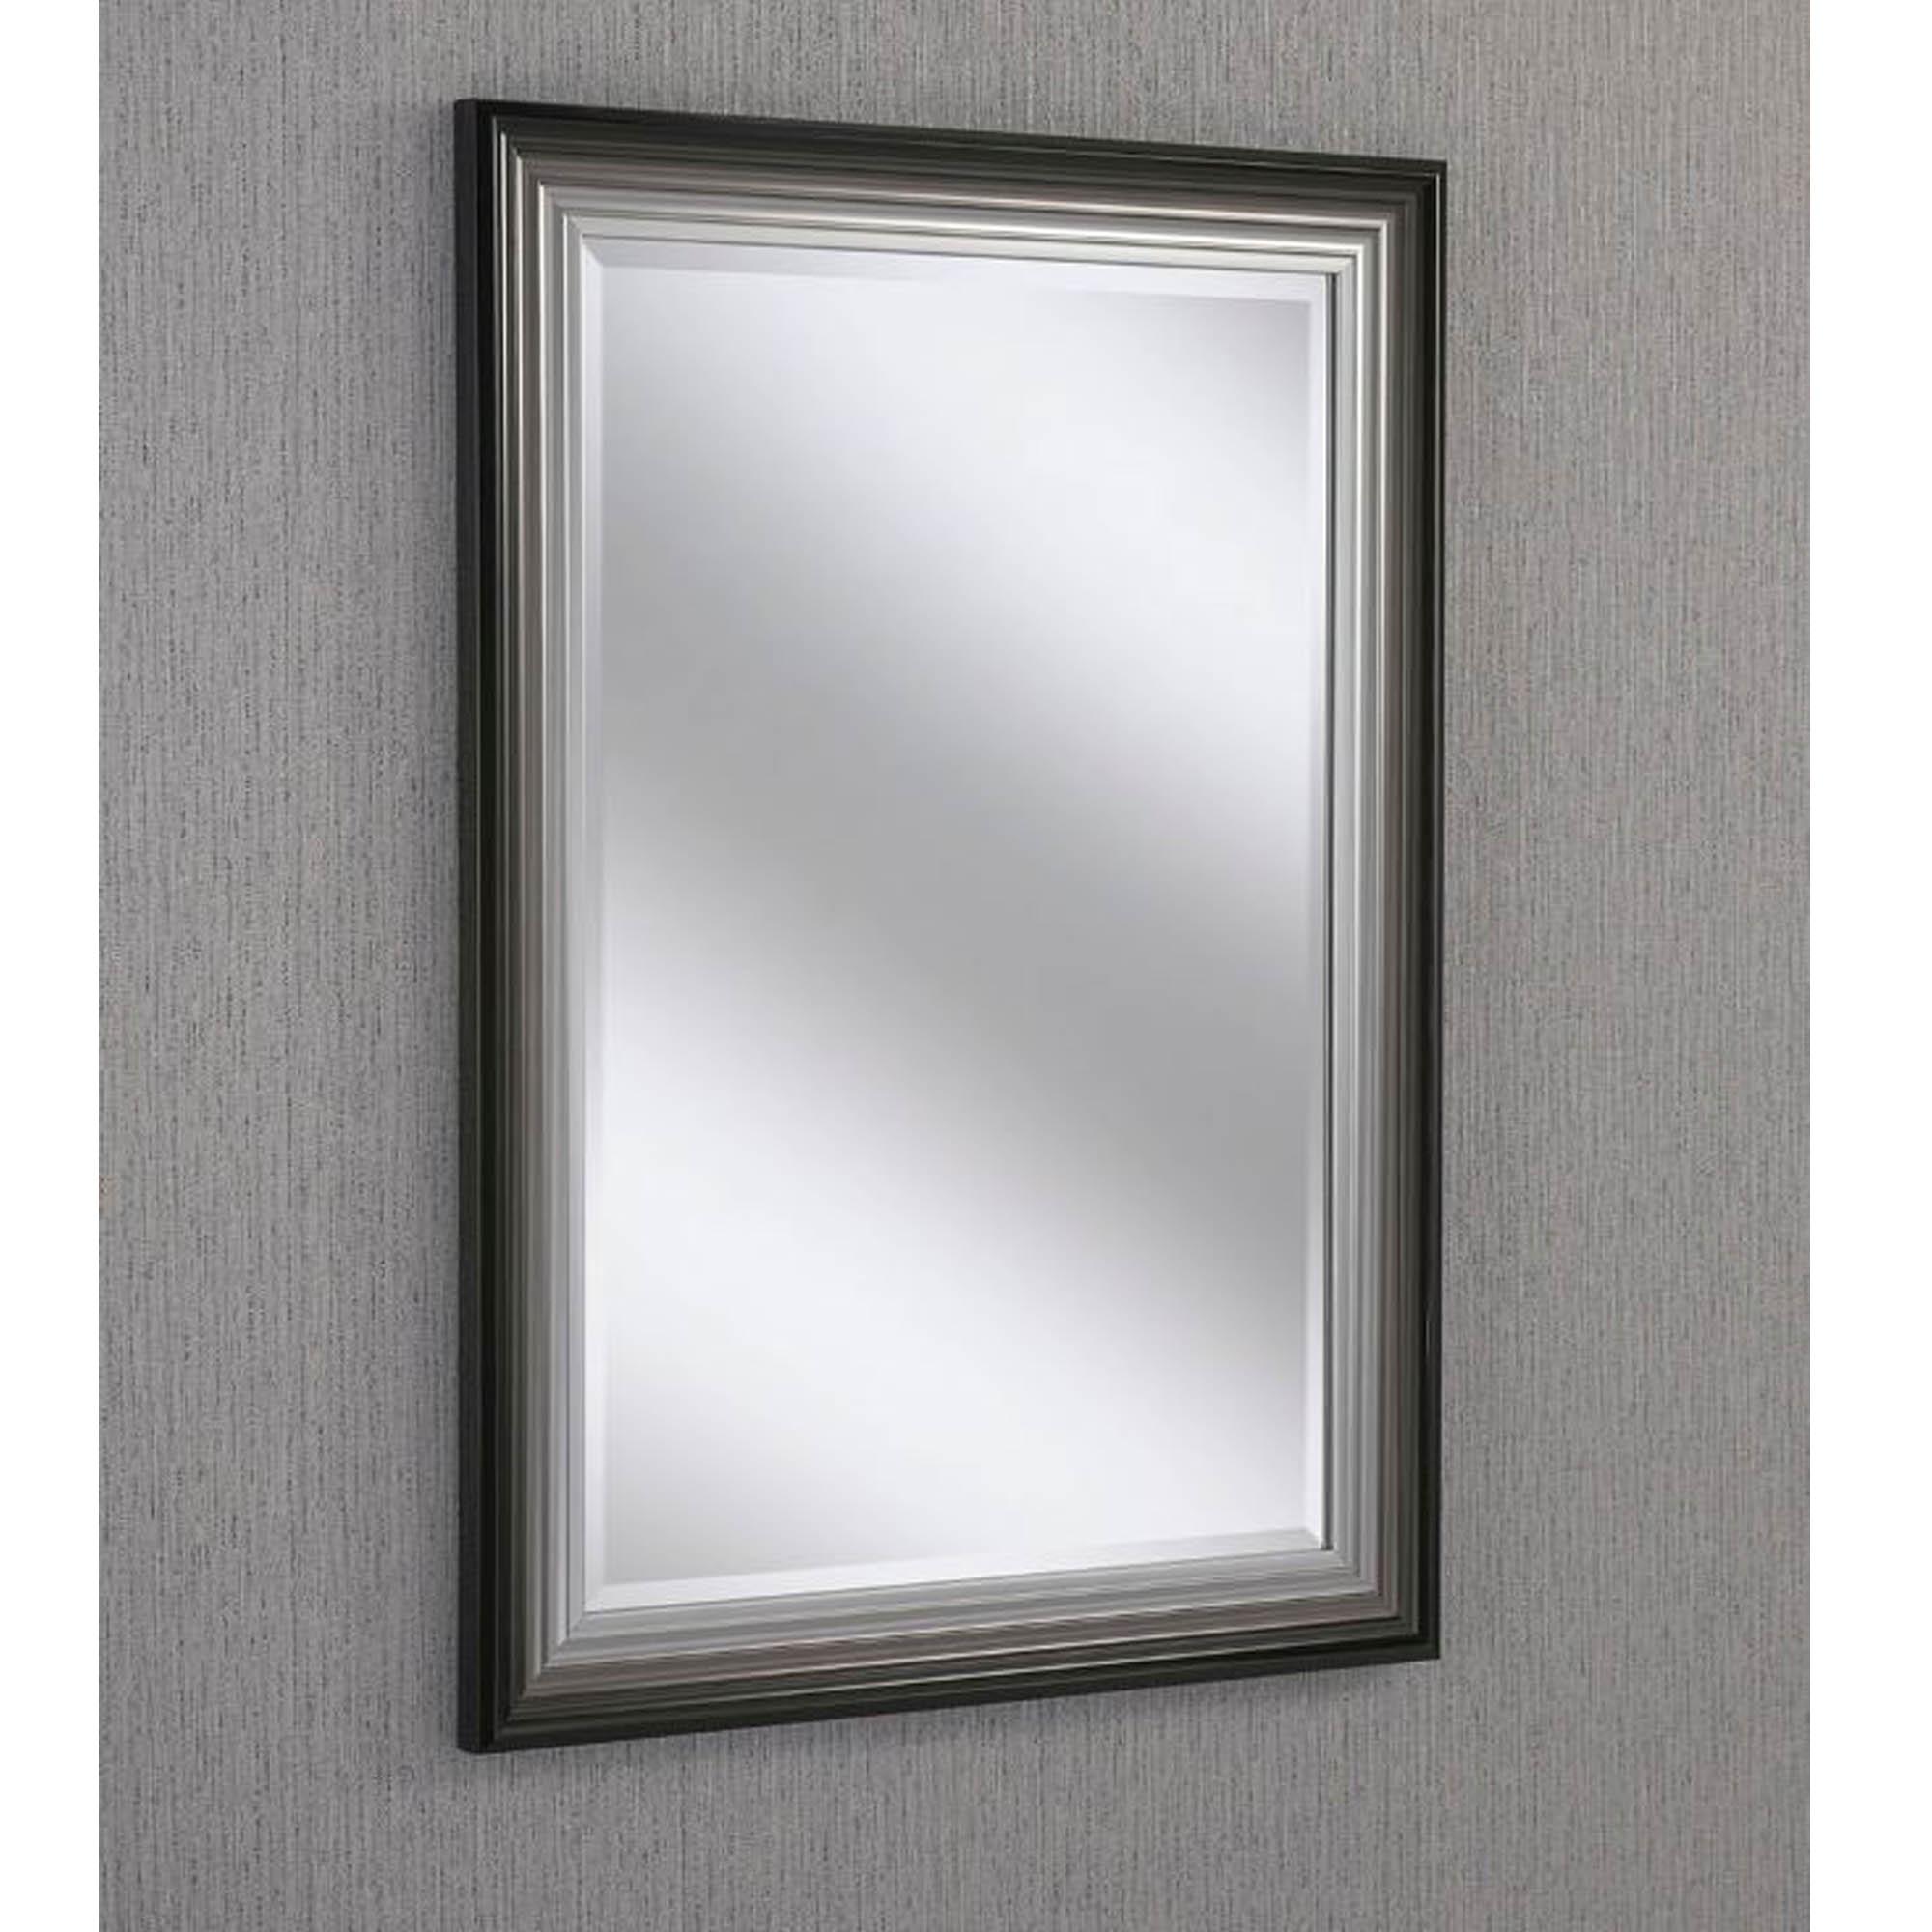 Rectangular Black Silver Beveled Contemporary Wall Mirror Hd365